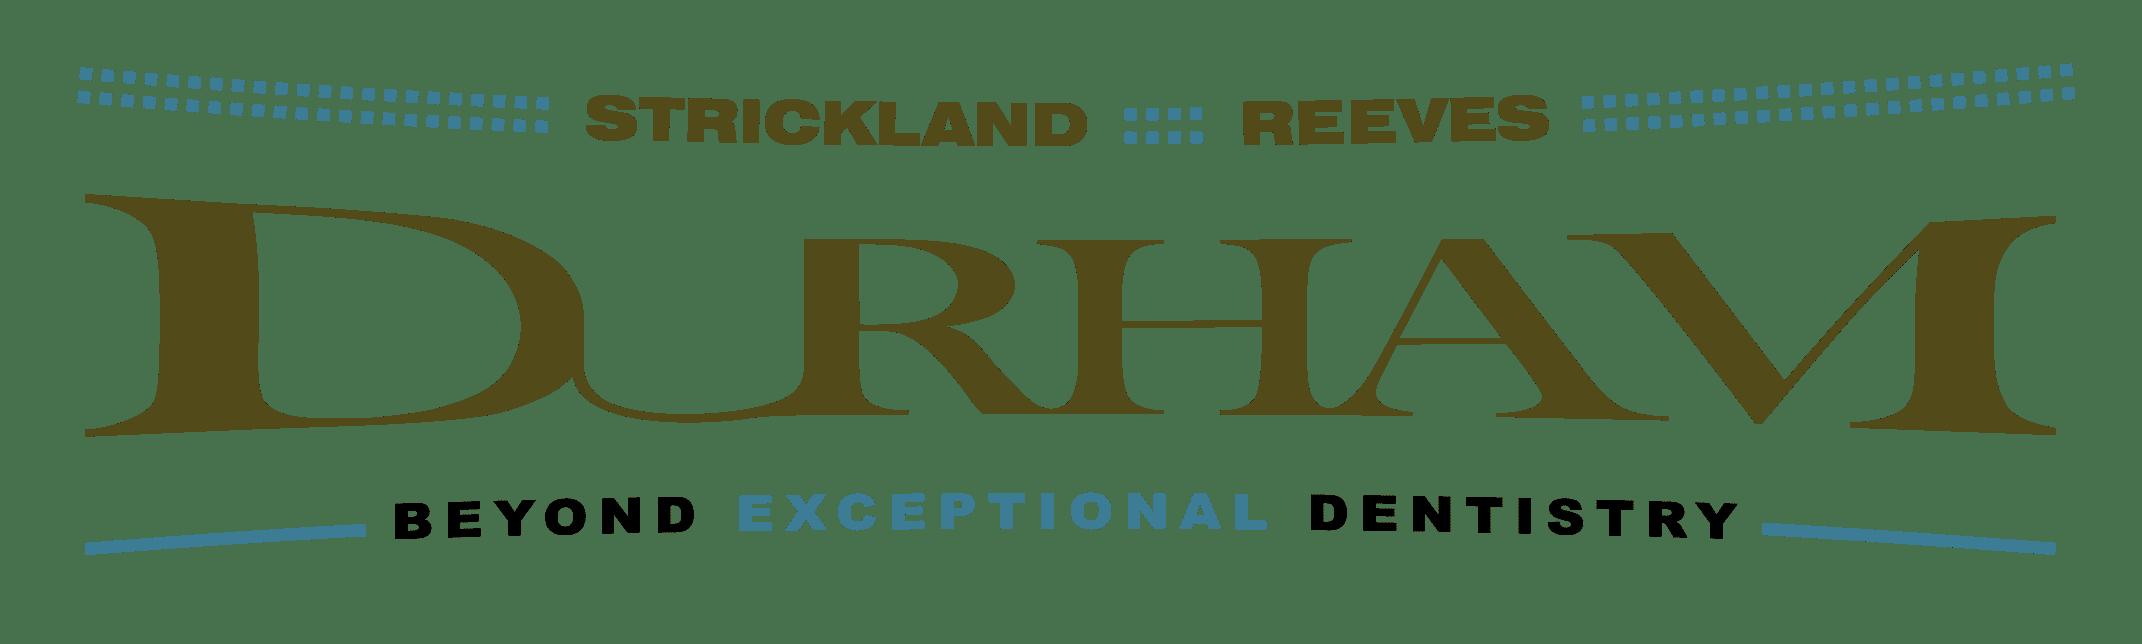 Durham Beyond Exceptional Dentistry Logo